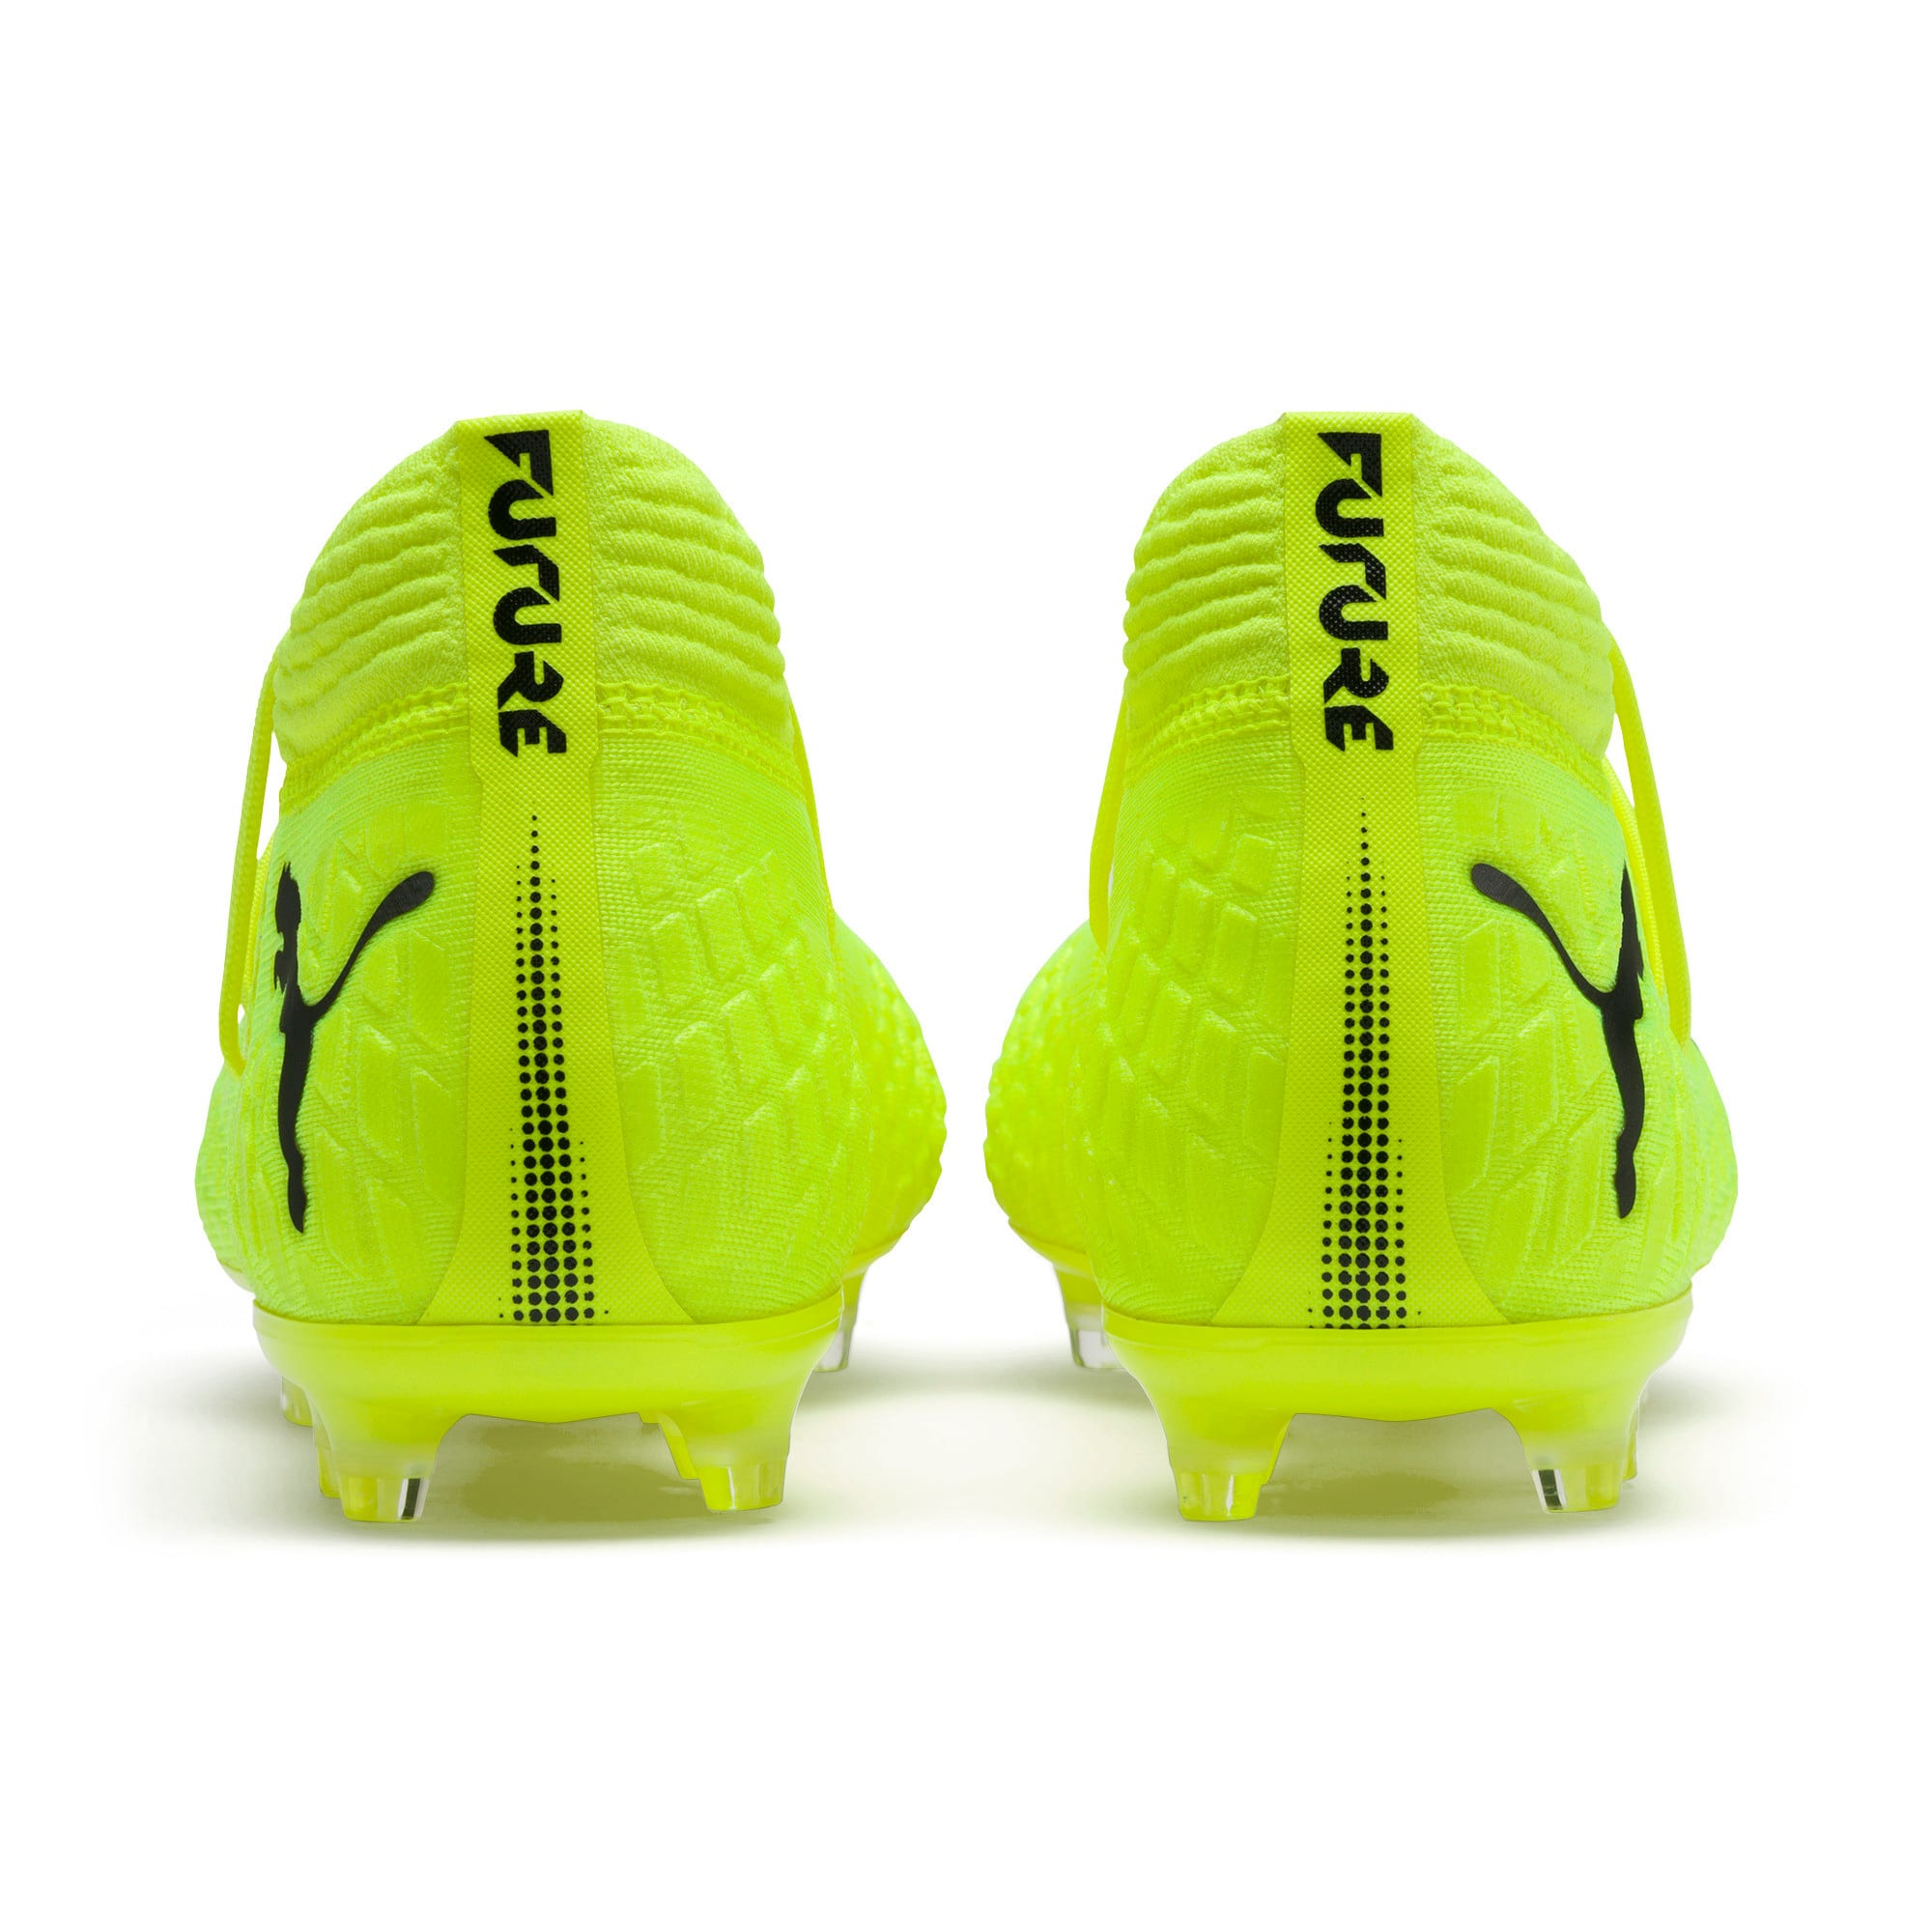 Thumbnail 3 of FUTURE 4.1 NETFIT Griezmann FG/AG Men's Football Boots, Yellow Alert-Puma Black, medium